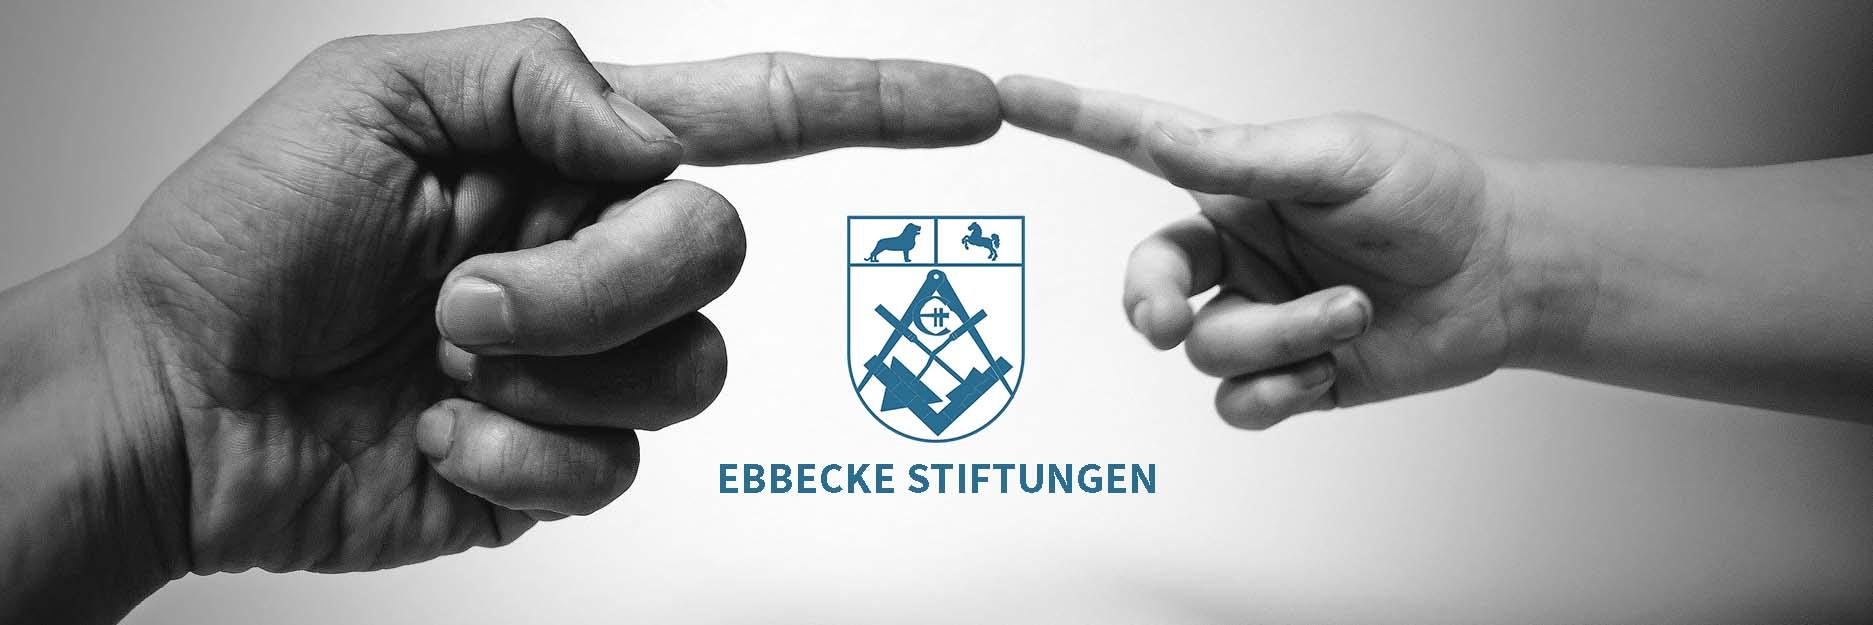 Ebbecke Stiftungen